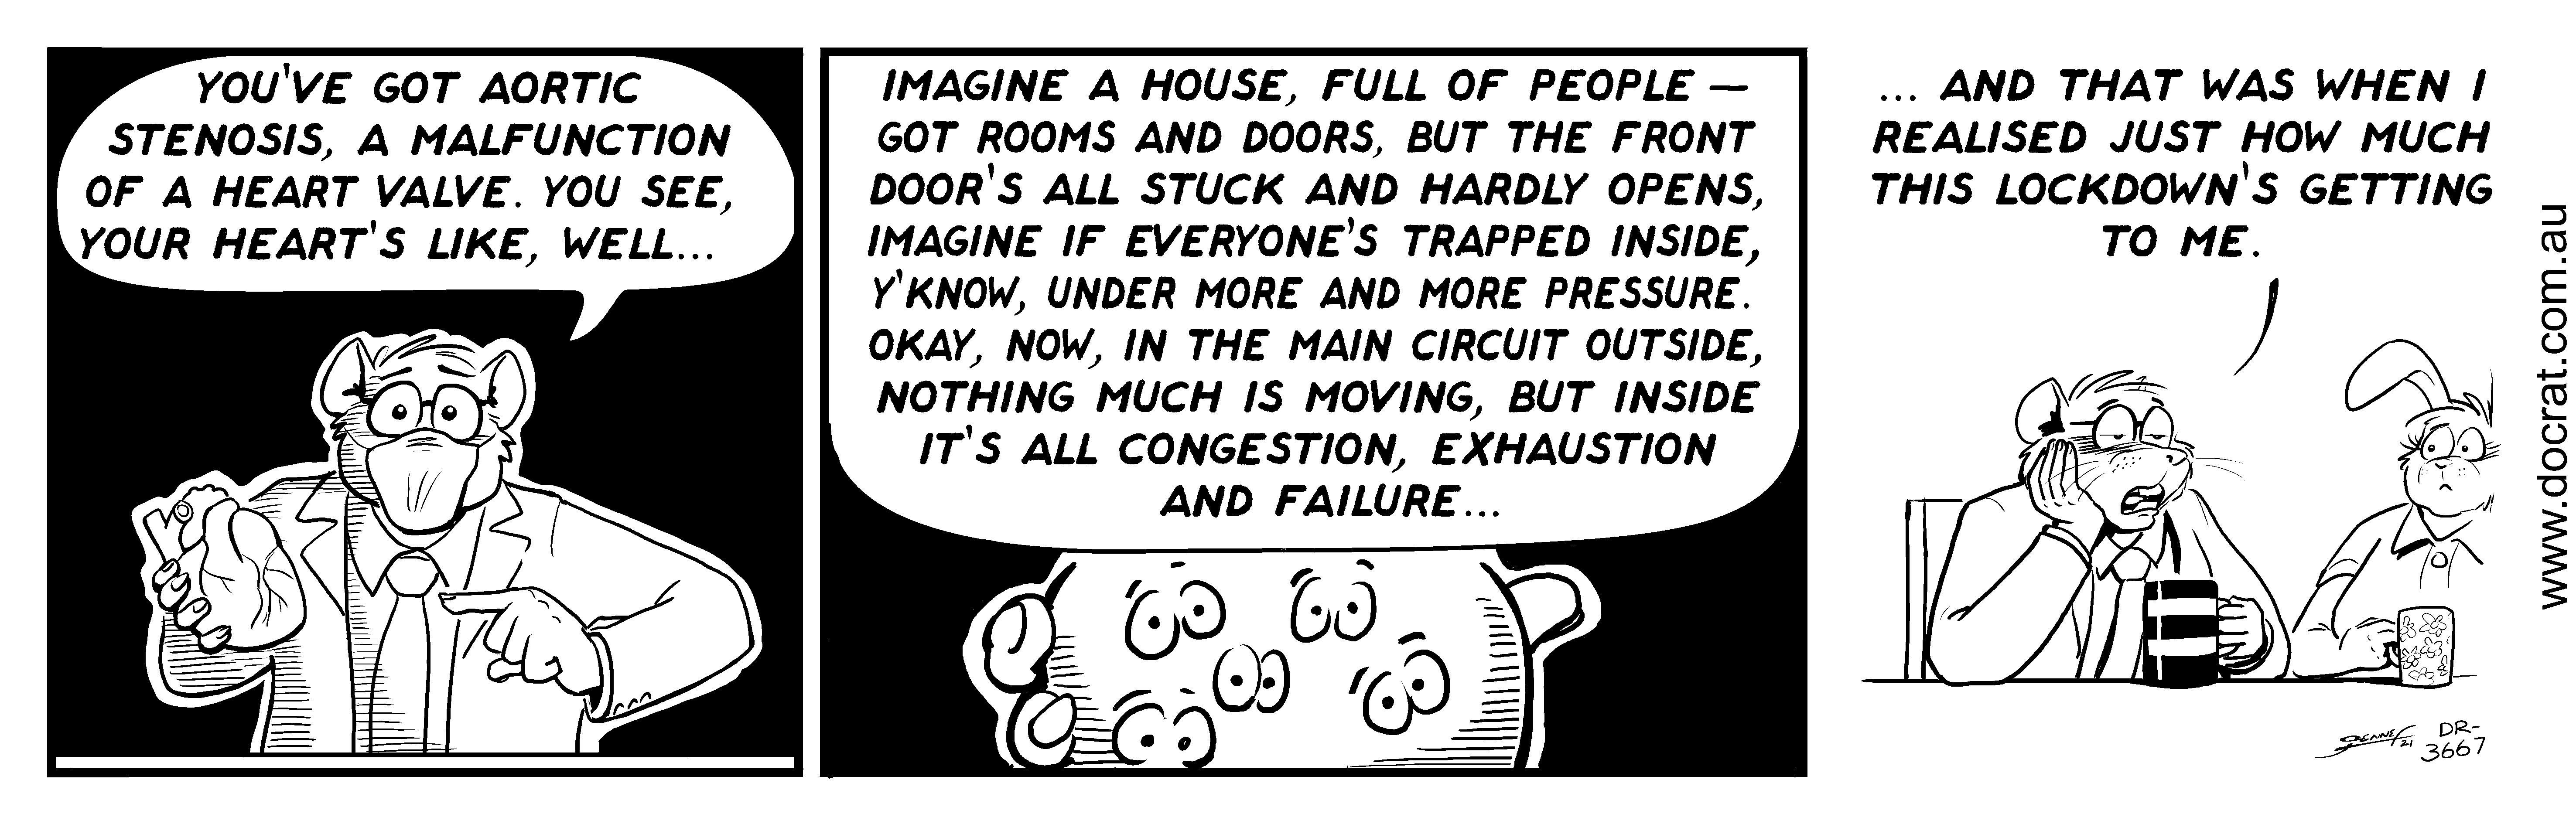 20210202